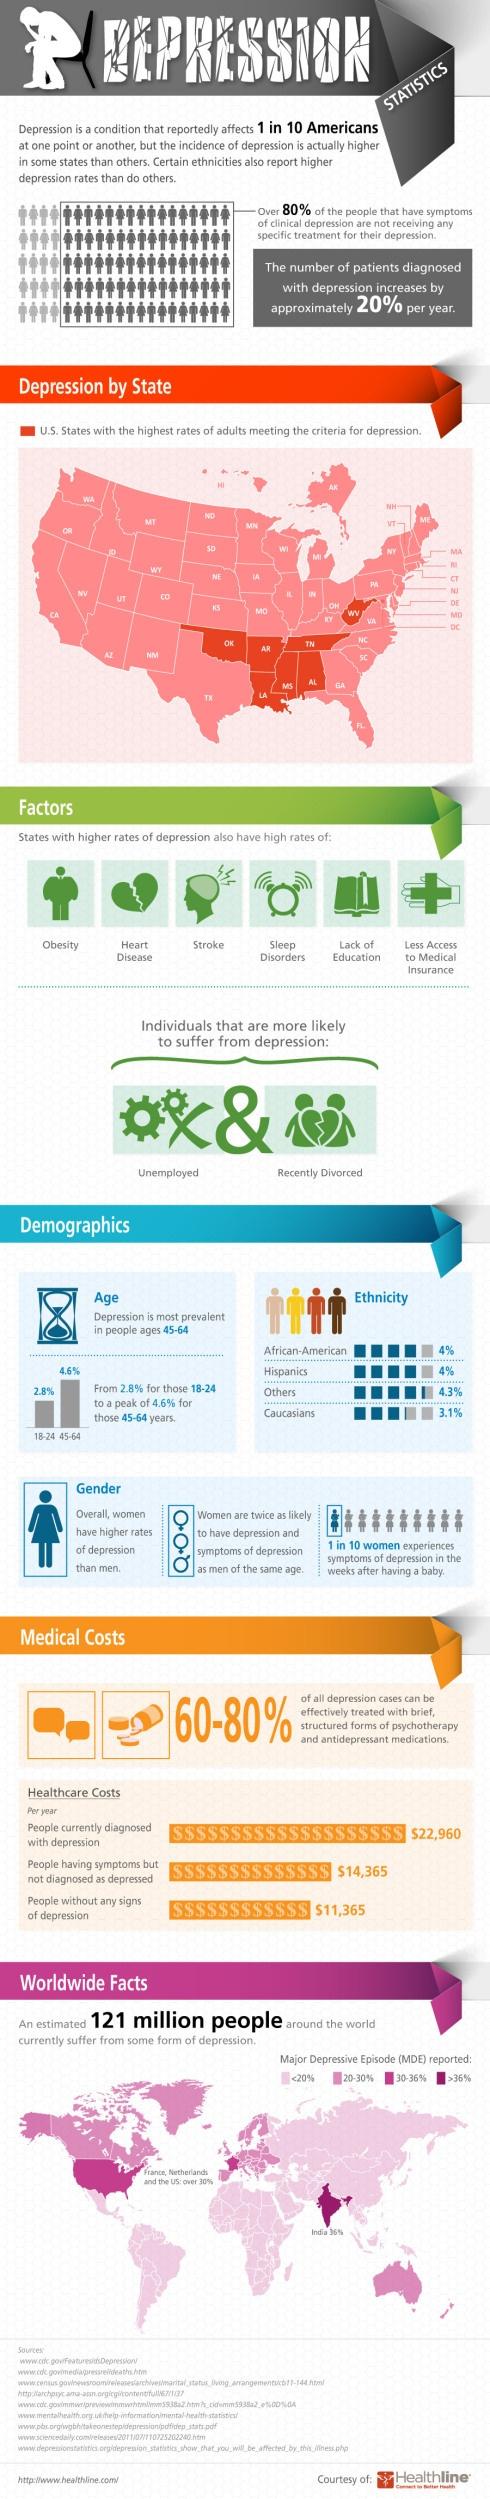 Depression statistics #infographic